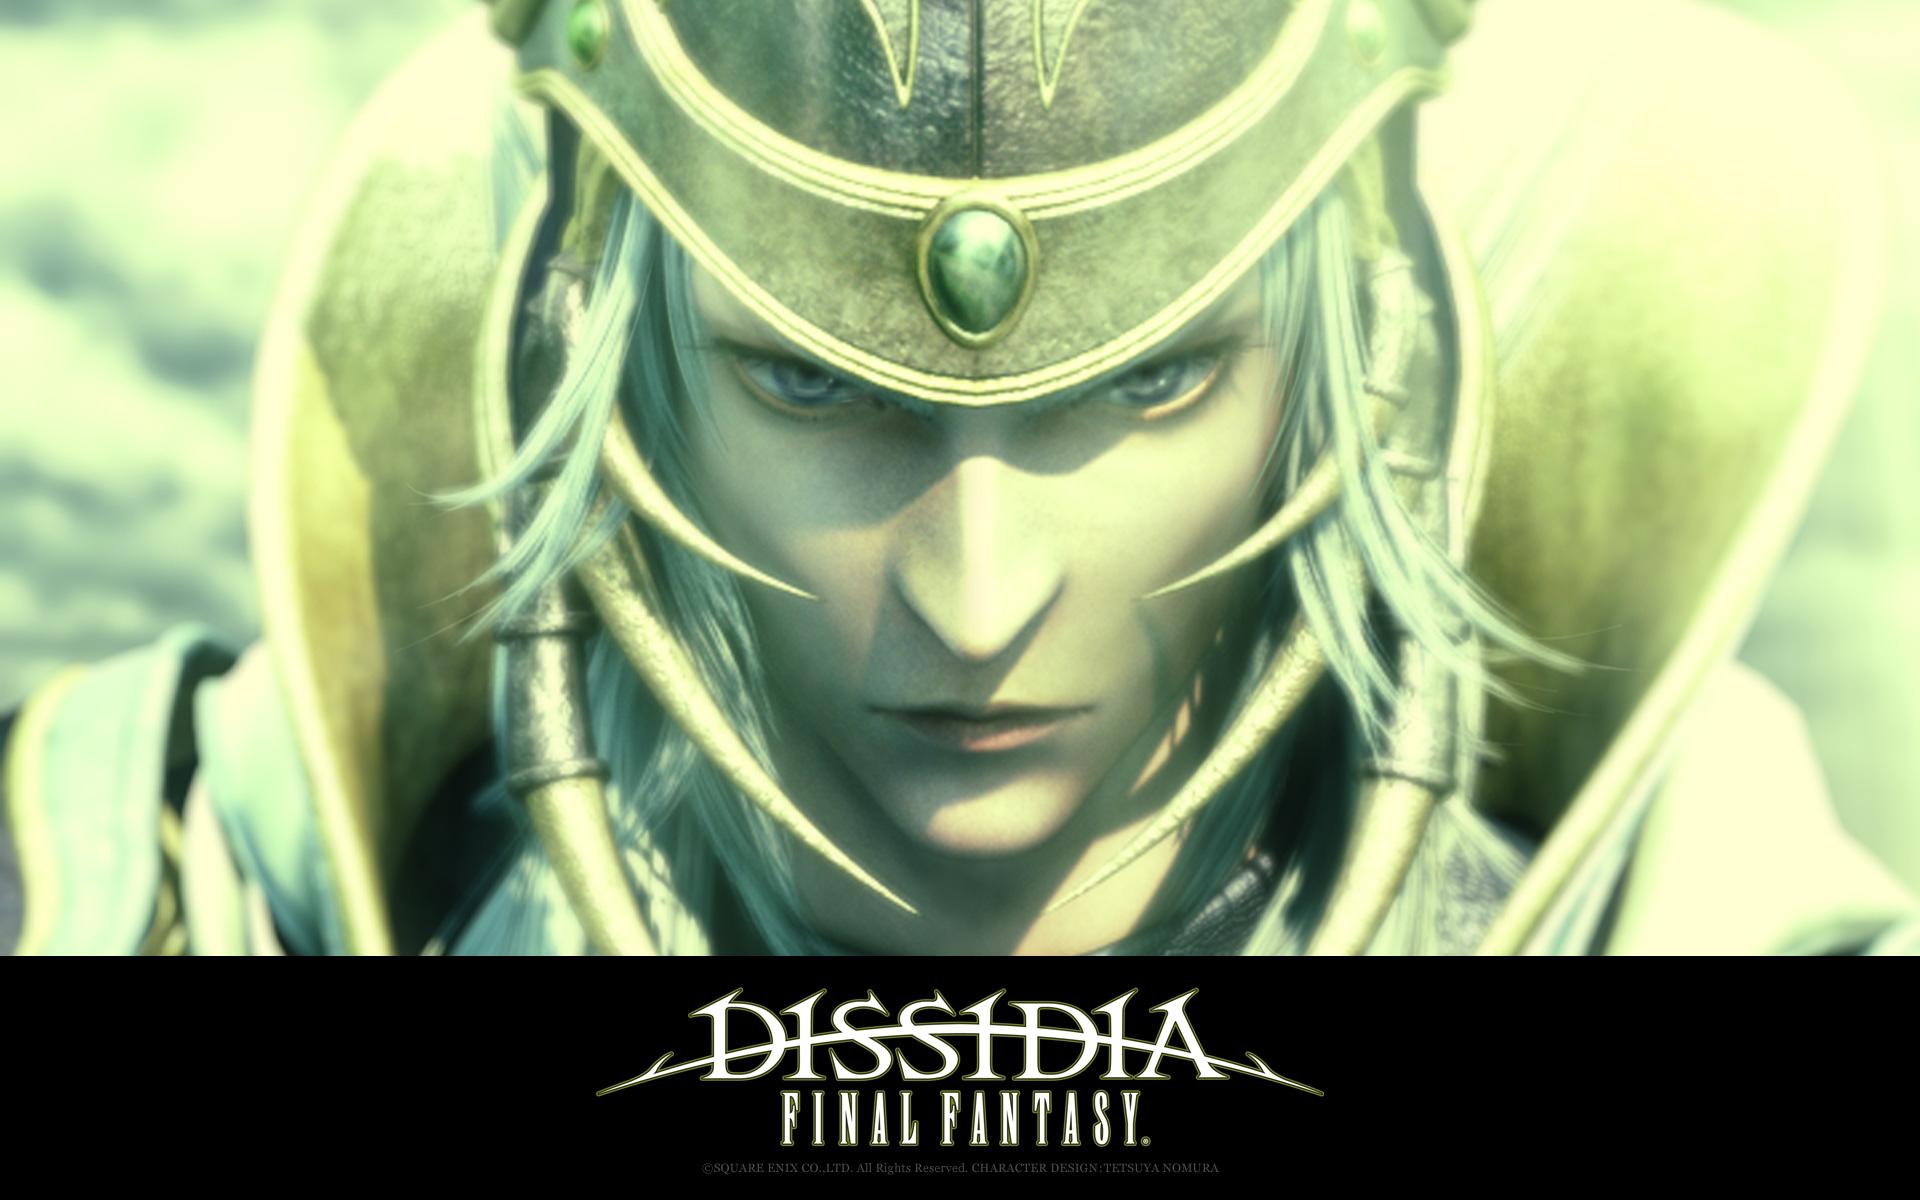 dissidia final fantasy wallpapers final fantasy wiki fandom rh finalfantasy fandom com